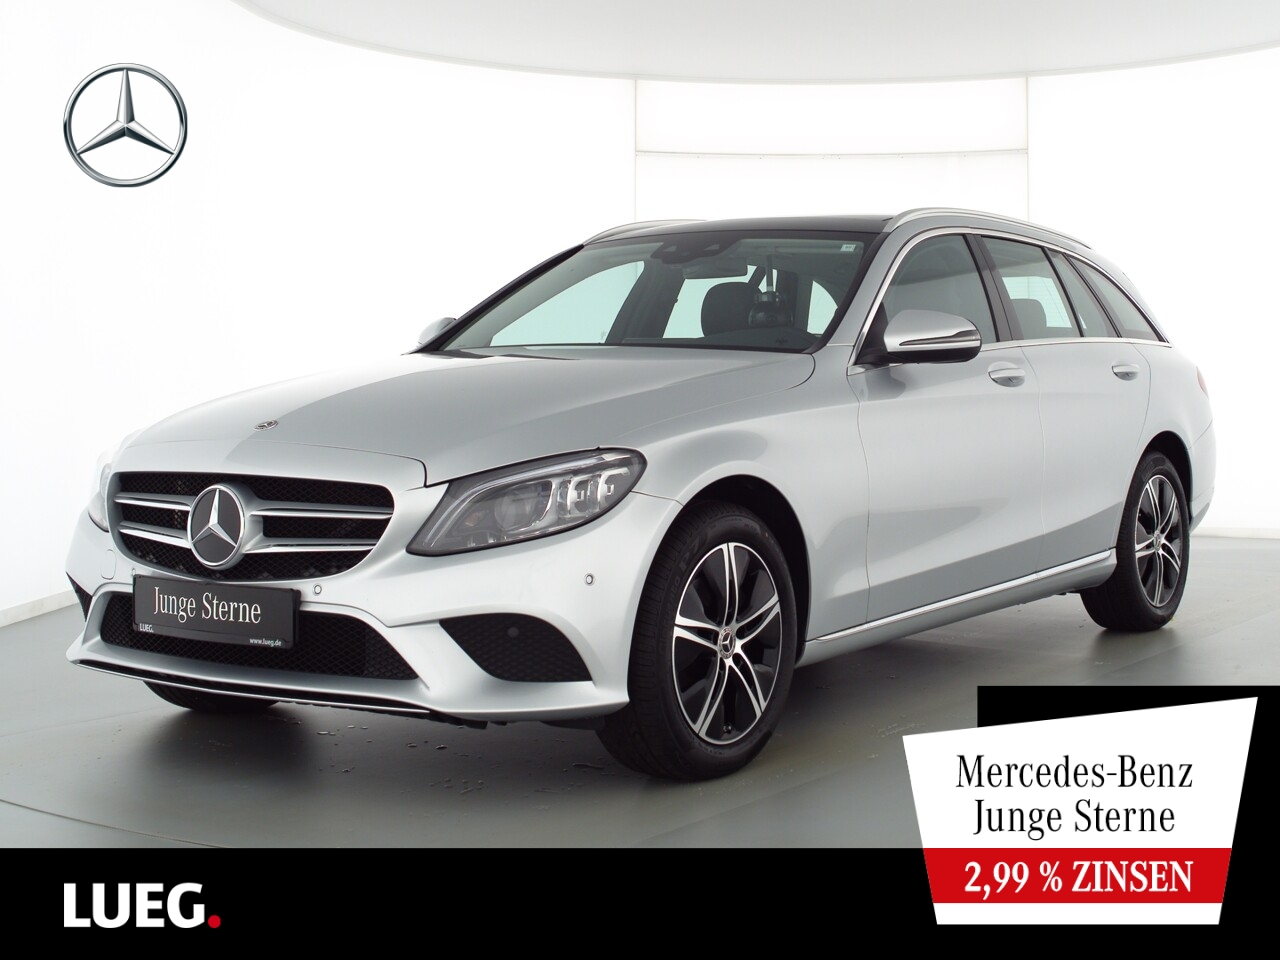 Mercedes-Benz C 220 d T 4M Avantgarde+COM+Pano+Mbeam+AHK+SpurP, Jahr 2020, Diesel